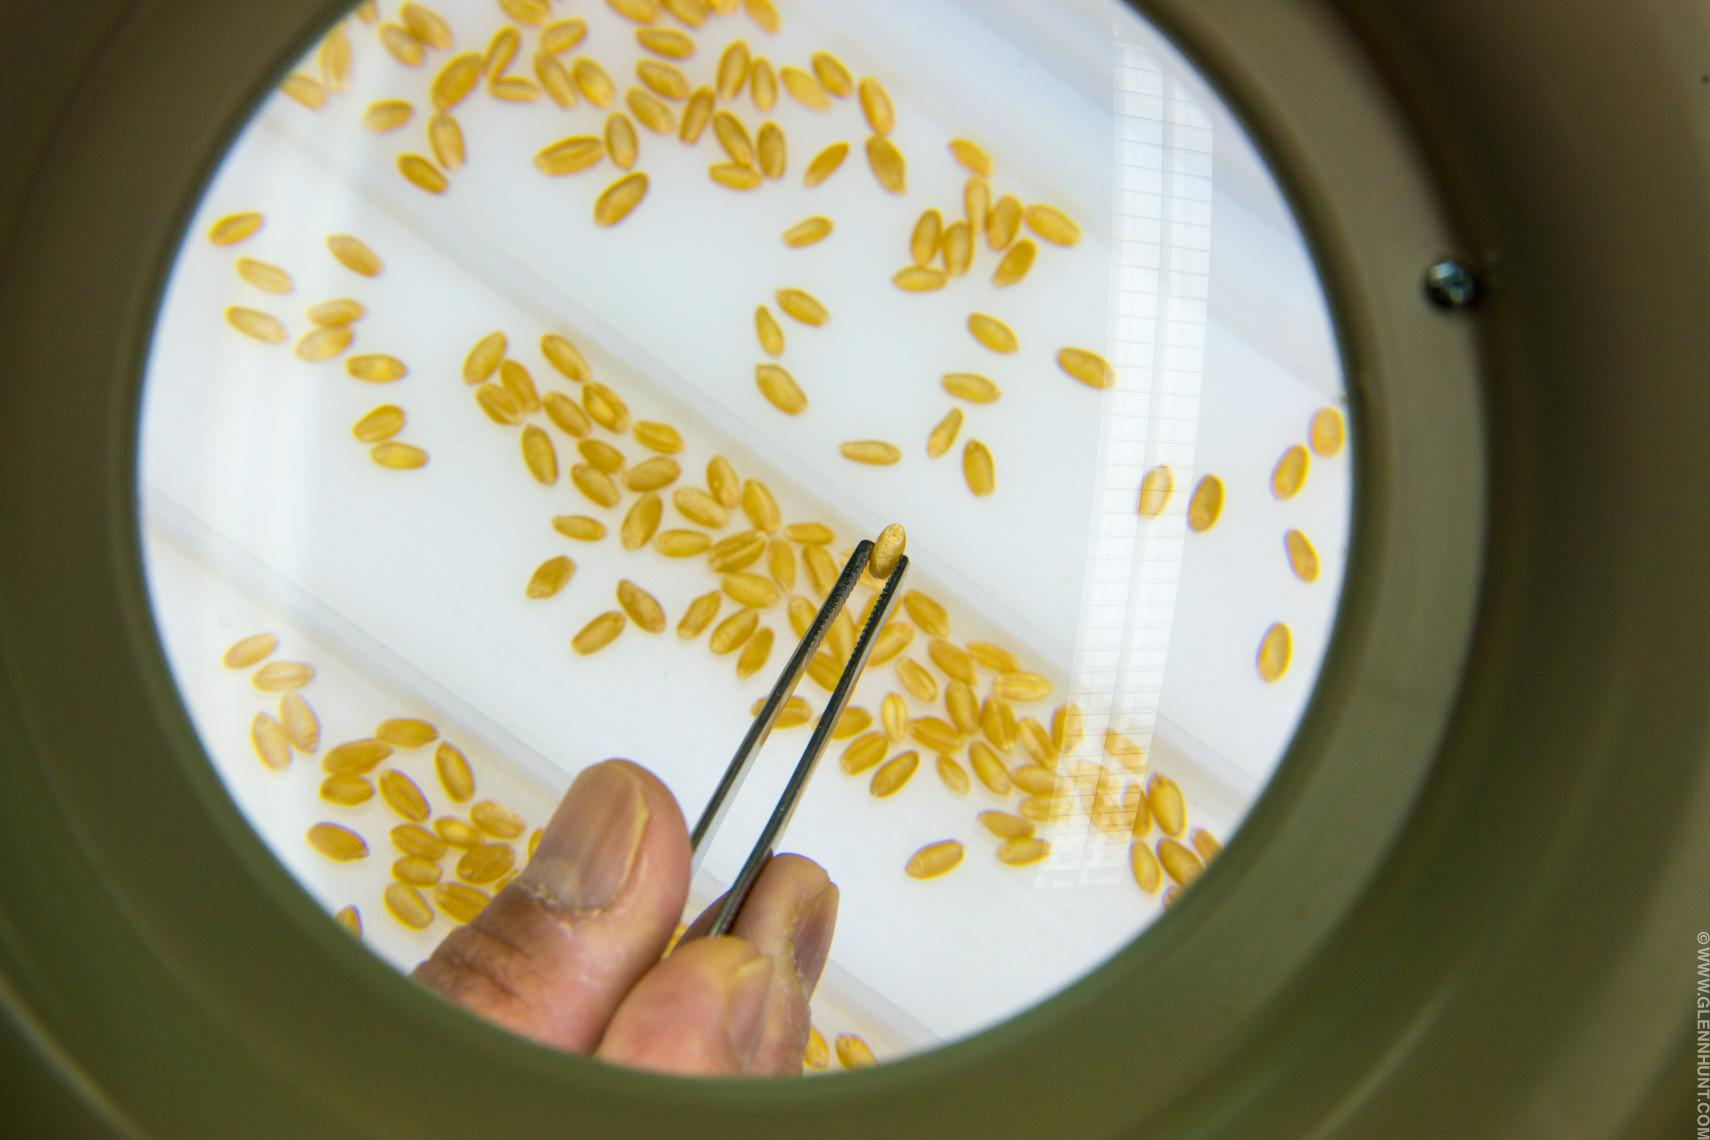 Viterra grain quality laboratory, Adelaide.